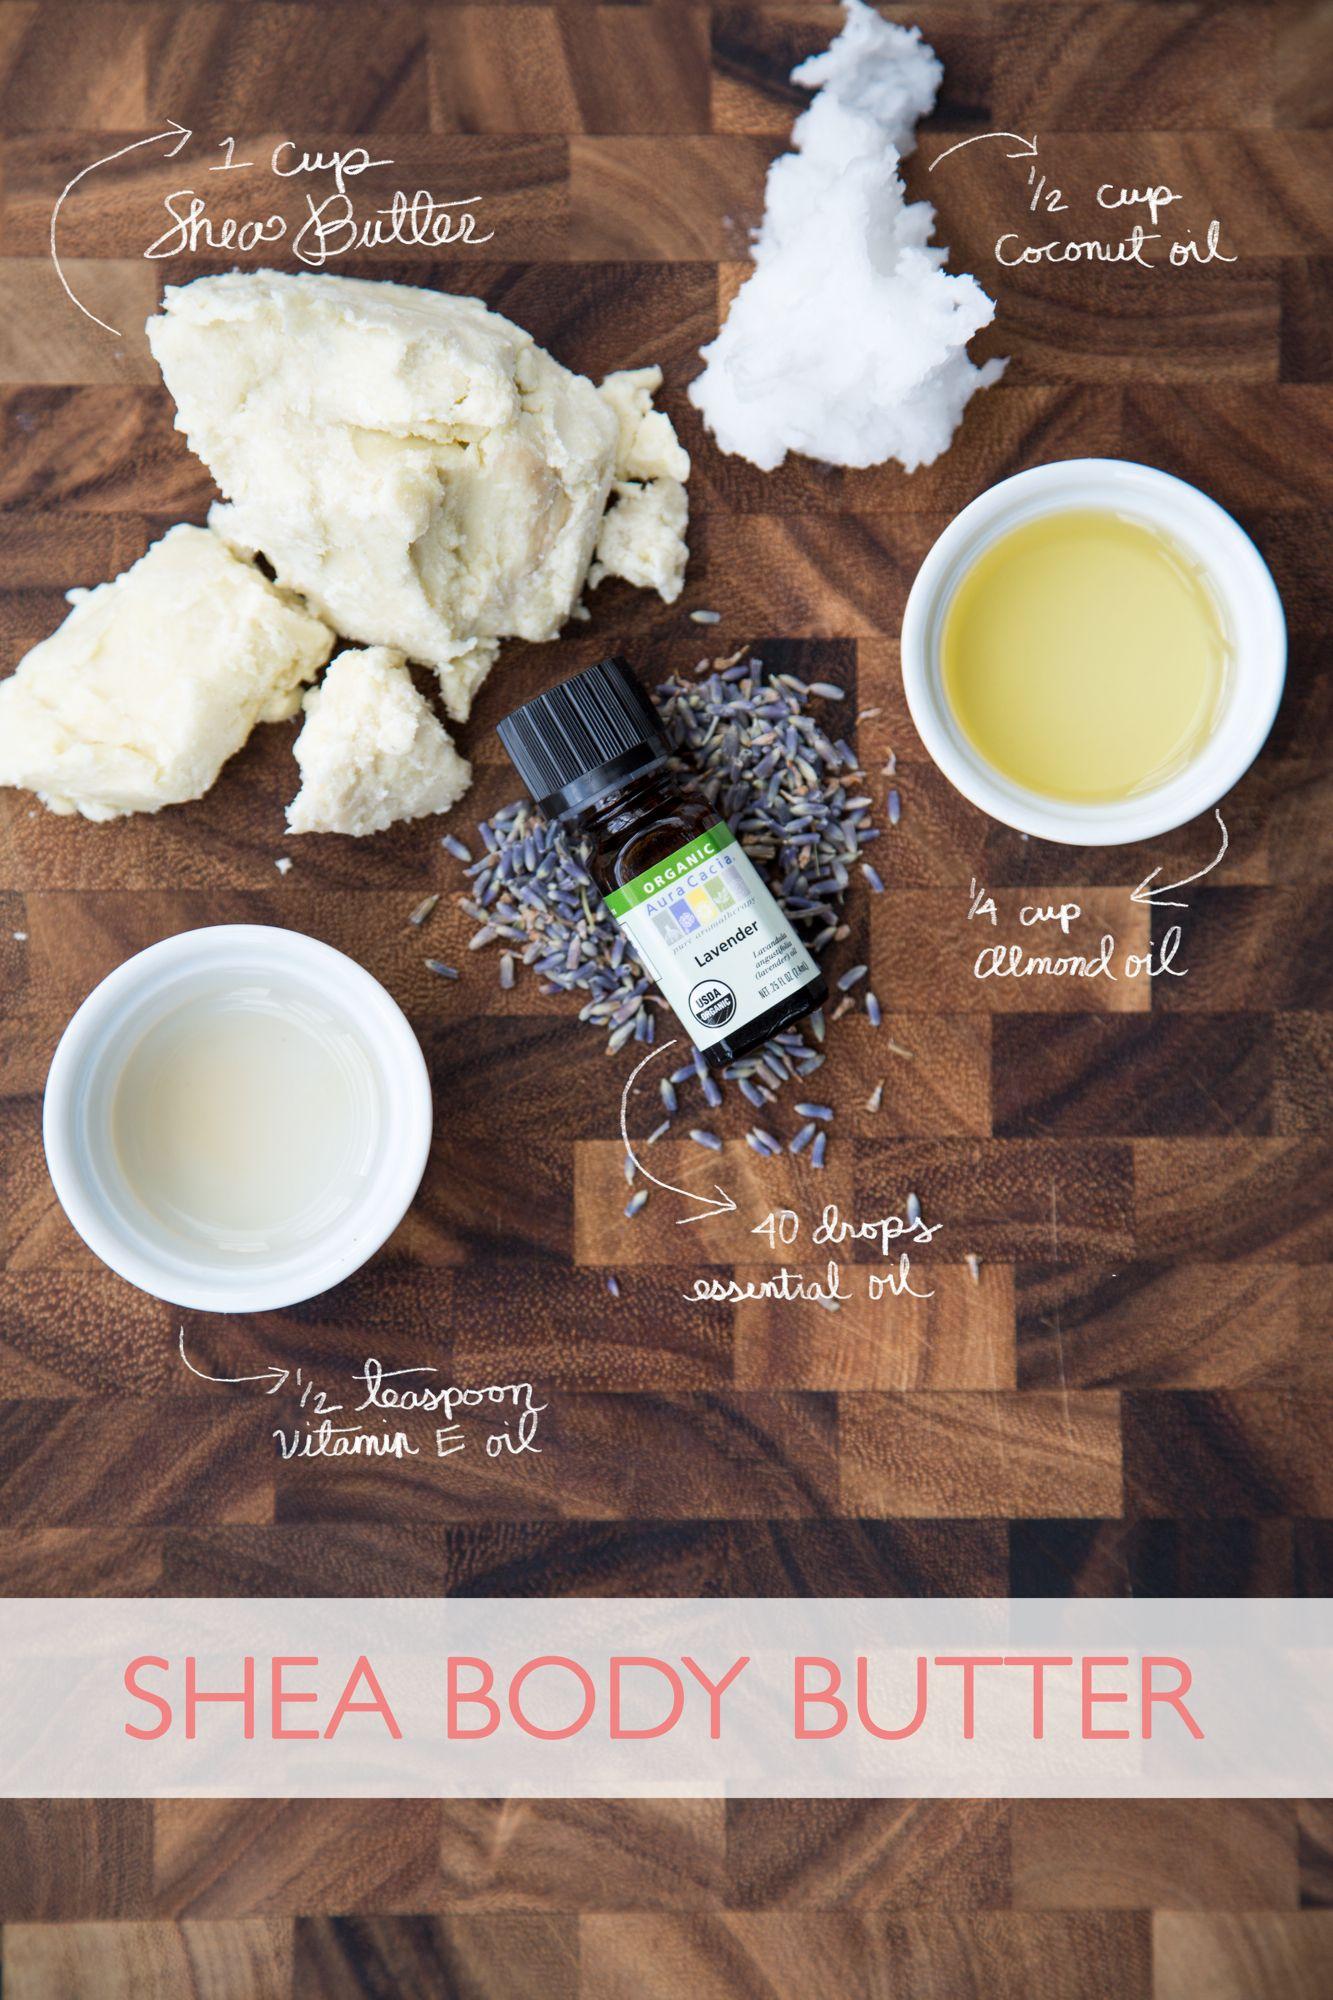 Diy body butter with shea butter coconut oil vitamin e